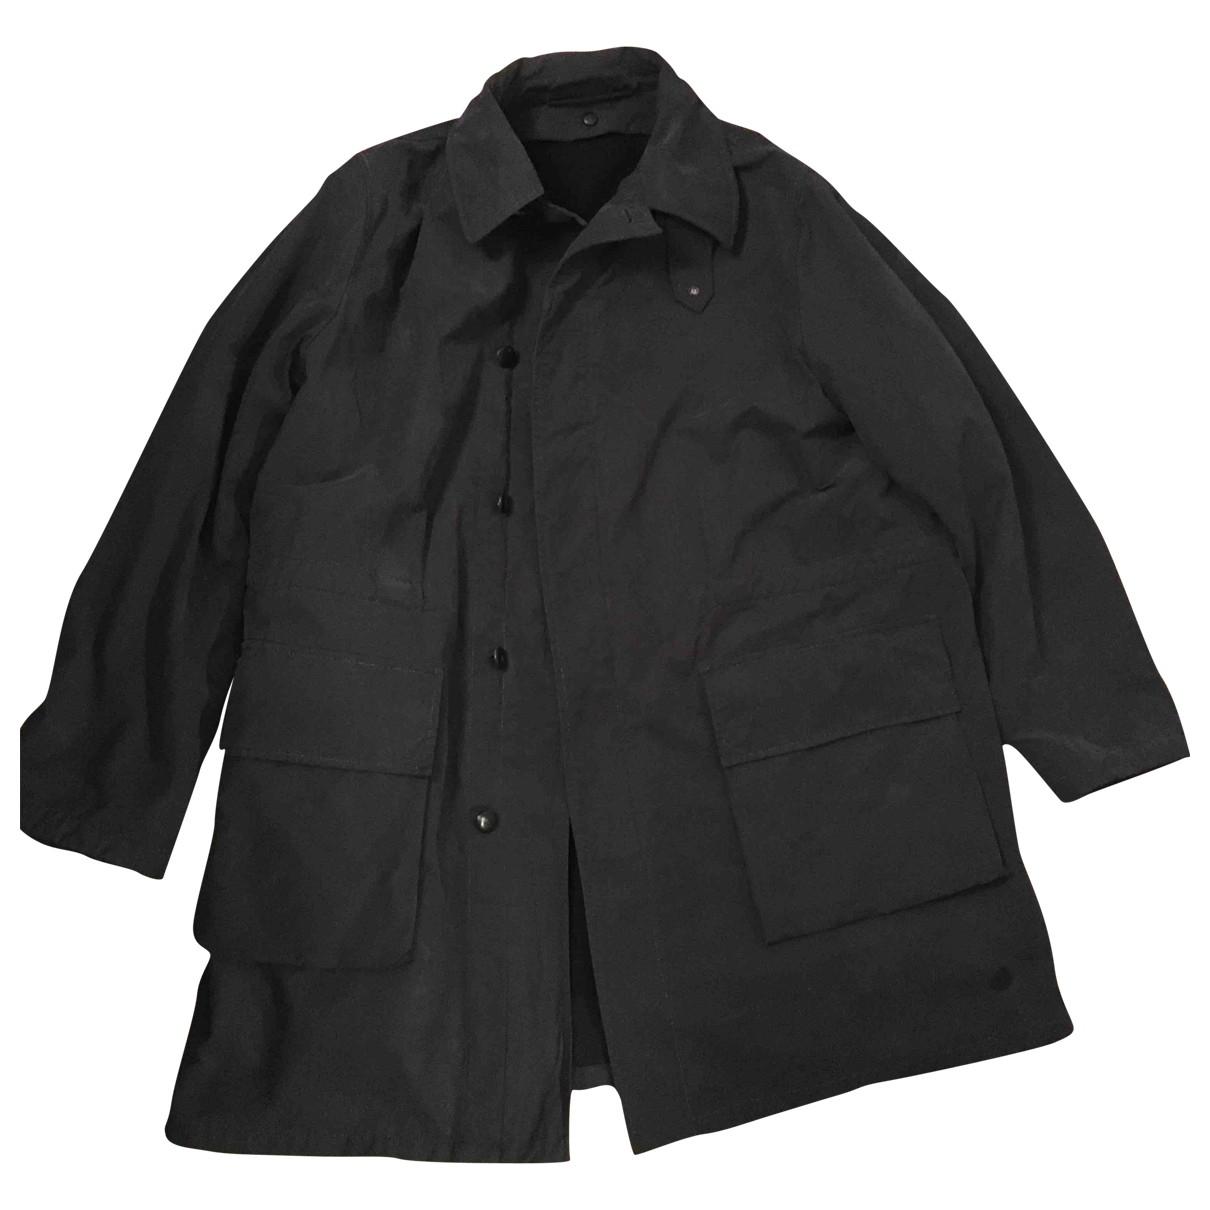 Armani Collezioni \N Grey coat  for Men 54 IT